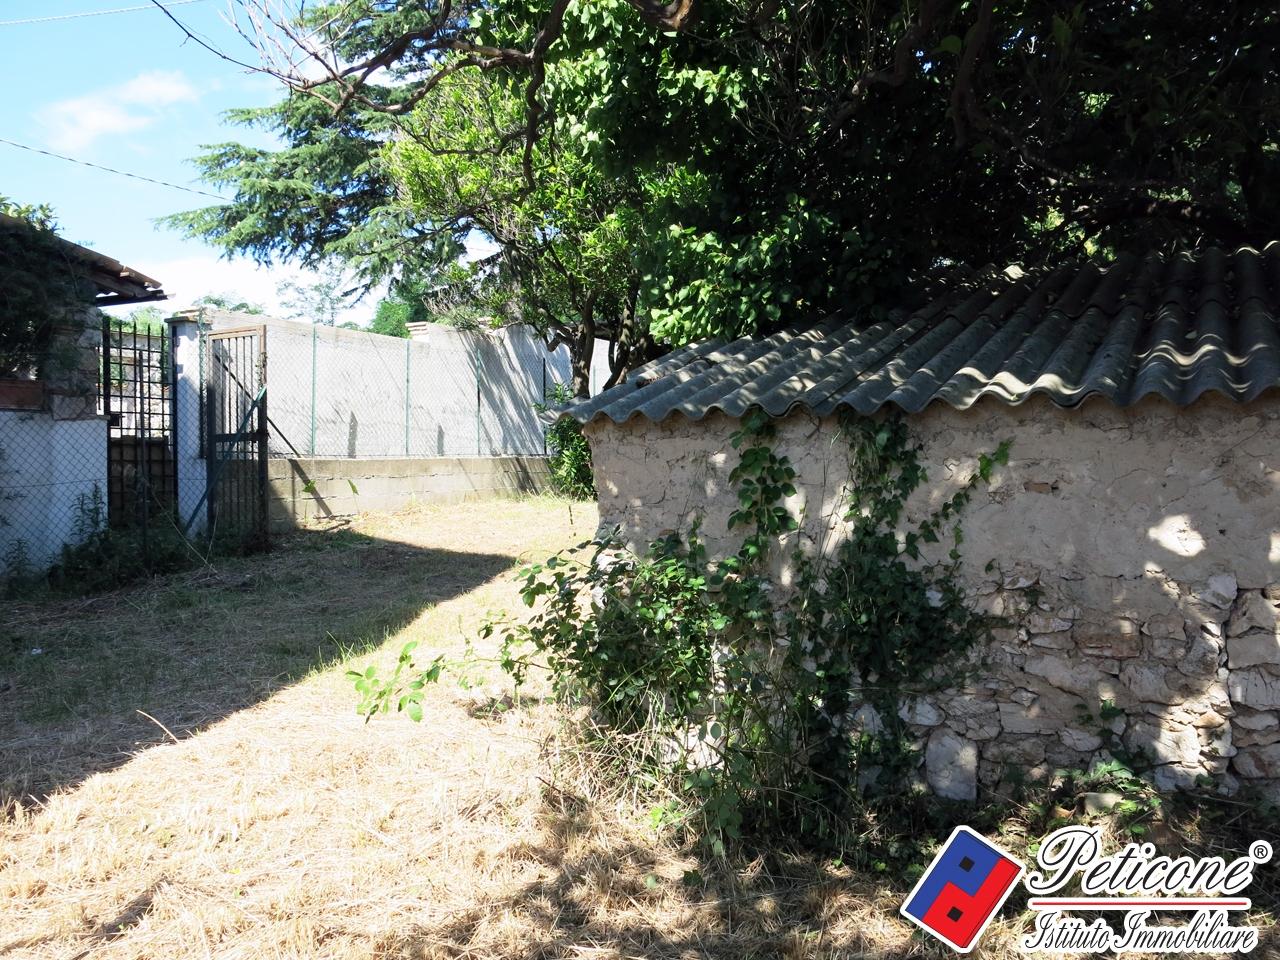 Villa in Vendita a Gaeta: 5 locali, 250 mq - Foto 29